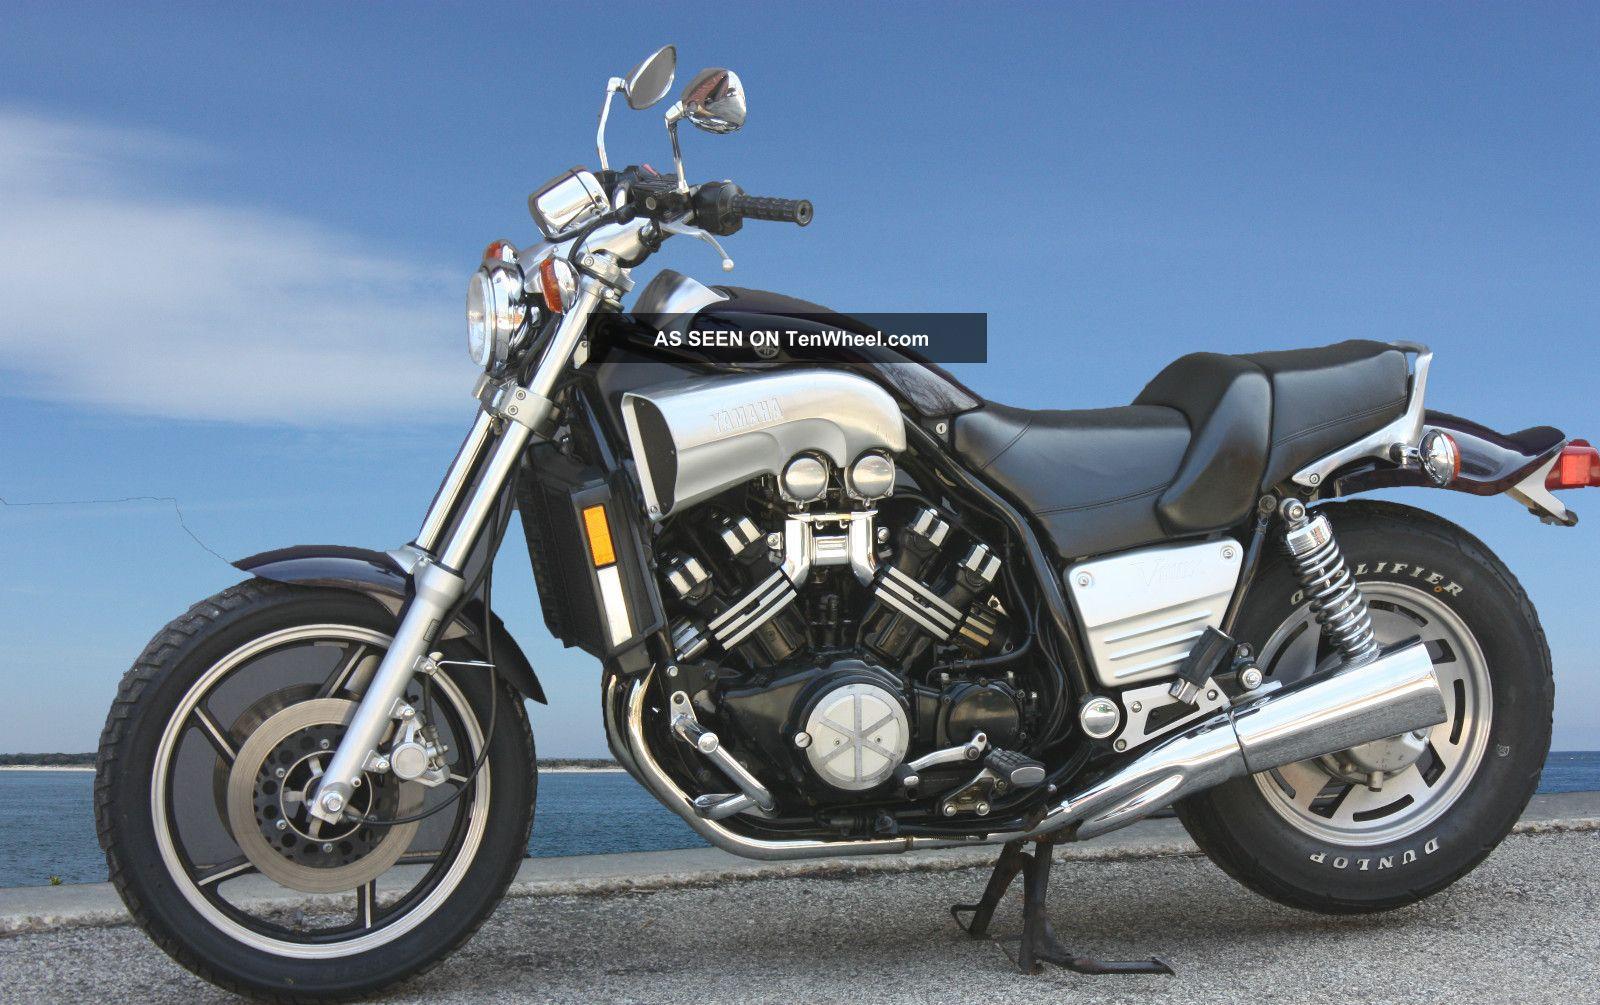 1985   2007 Yamaha V Max 1200 Parts furthermore 271127764938 in addition Yamaha Big Bikes furthermore hdforums   forum generalharleydavidsonchat 537660whatmakesabobberabobber further Motorcycle History Honda 750 Magna. on yamaha v65 magna